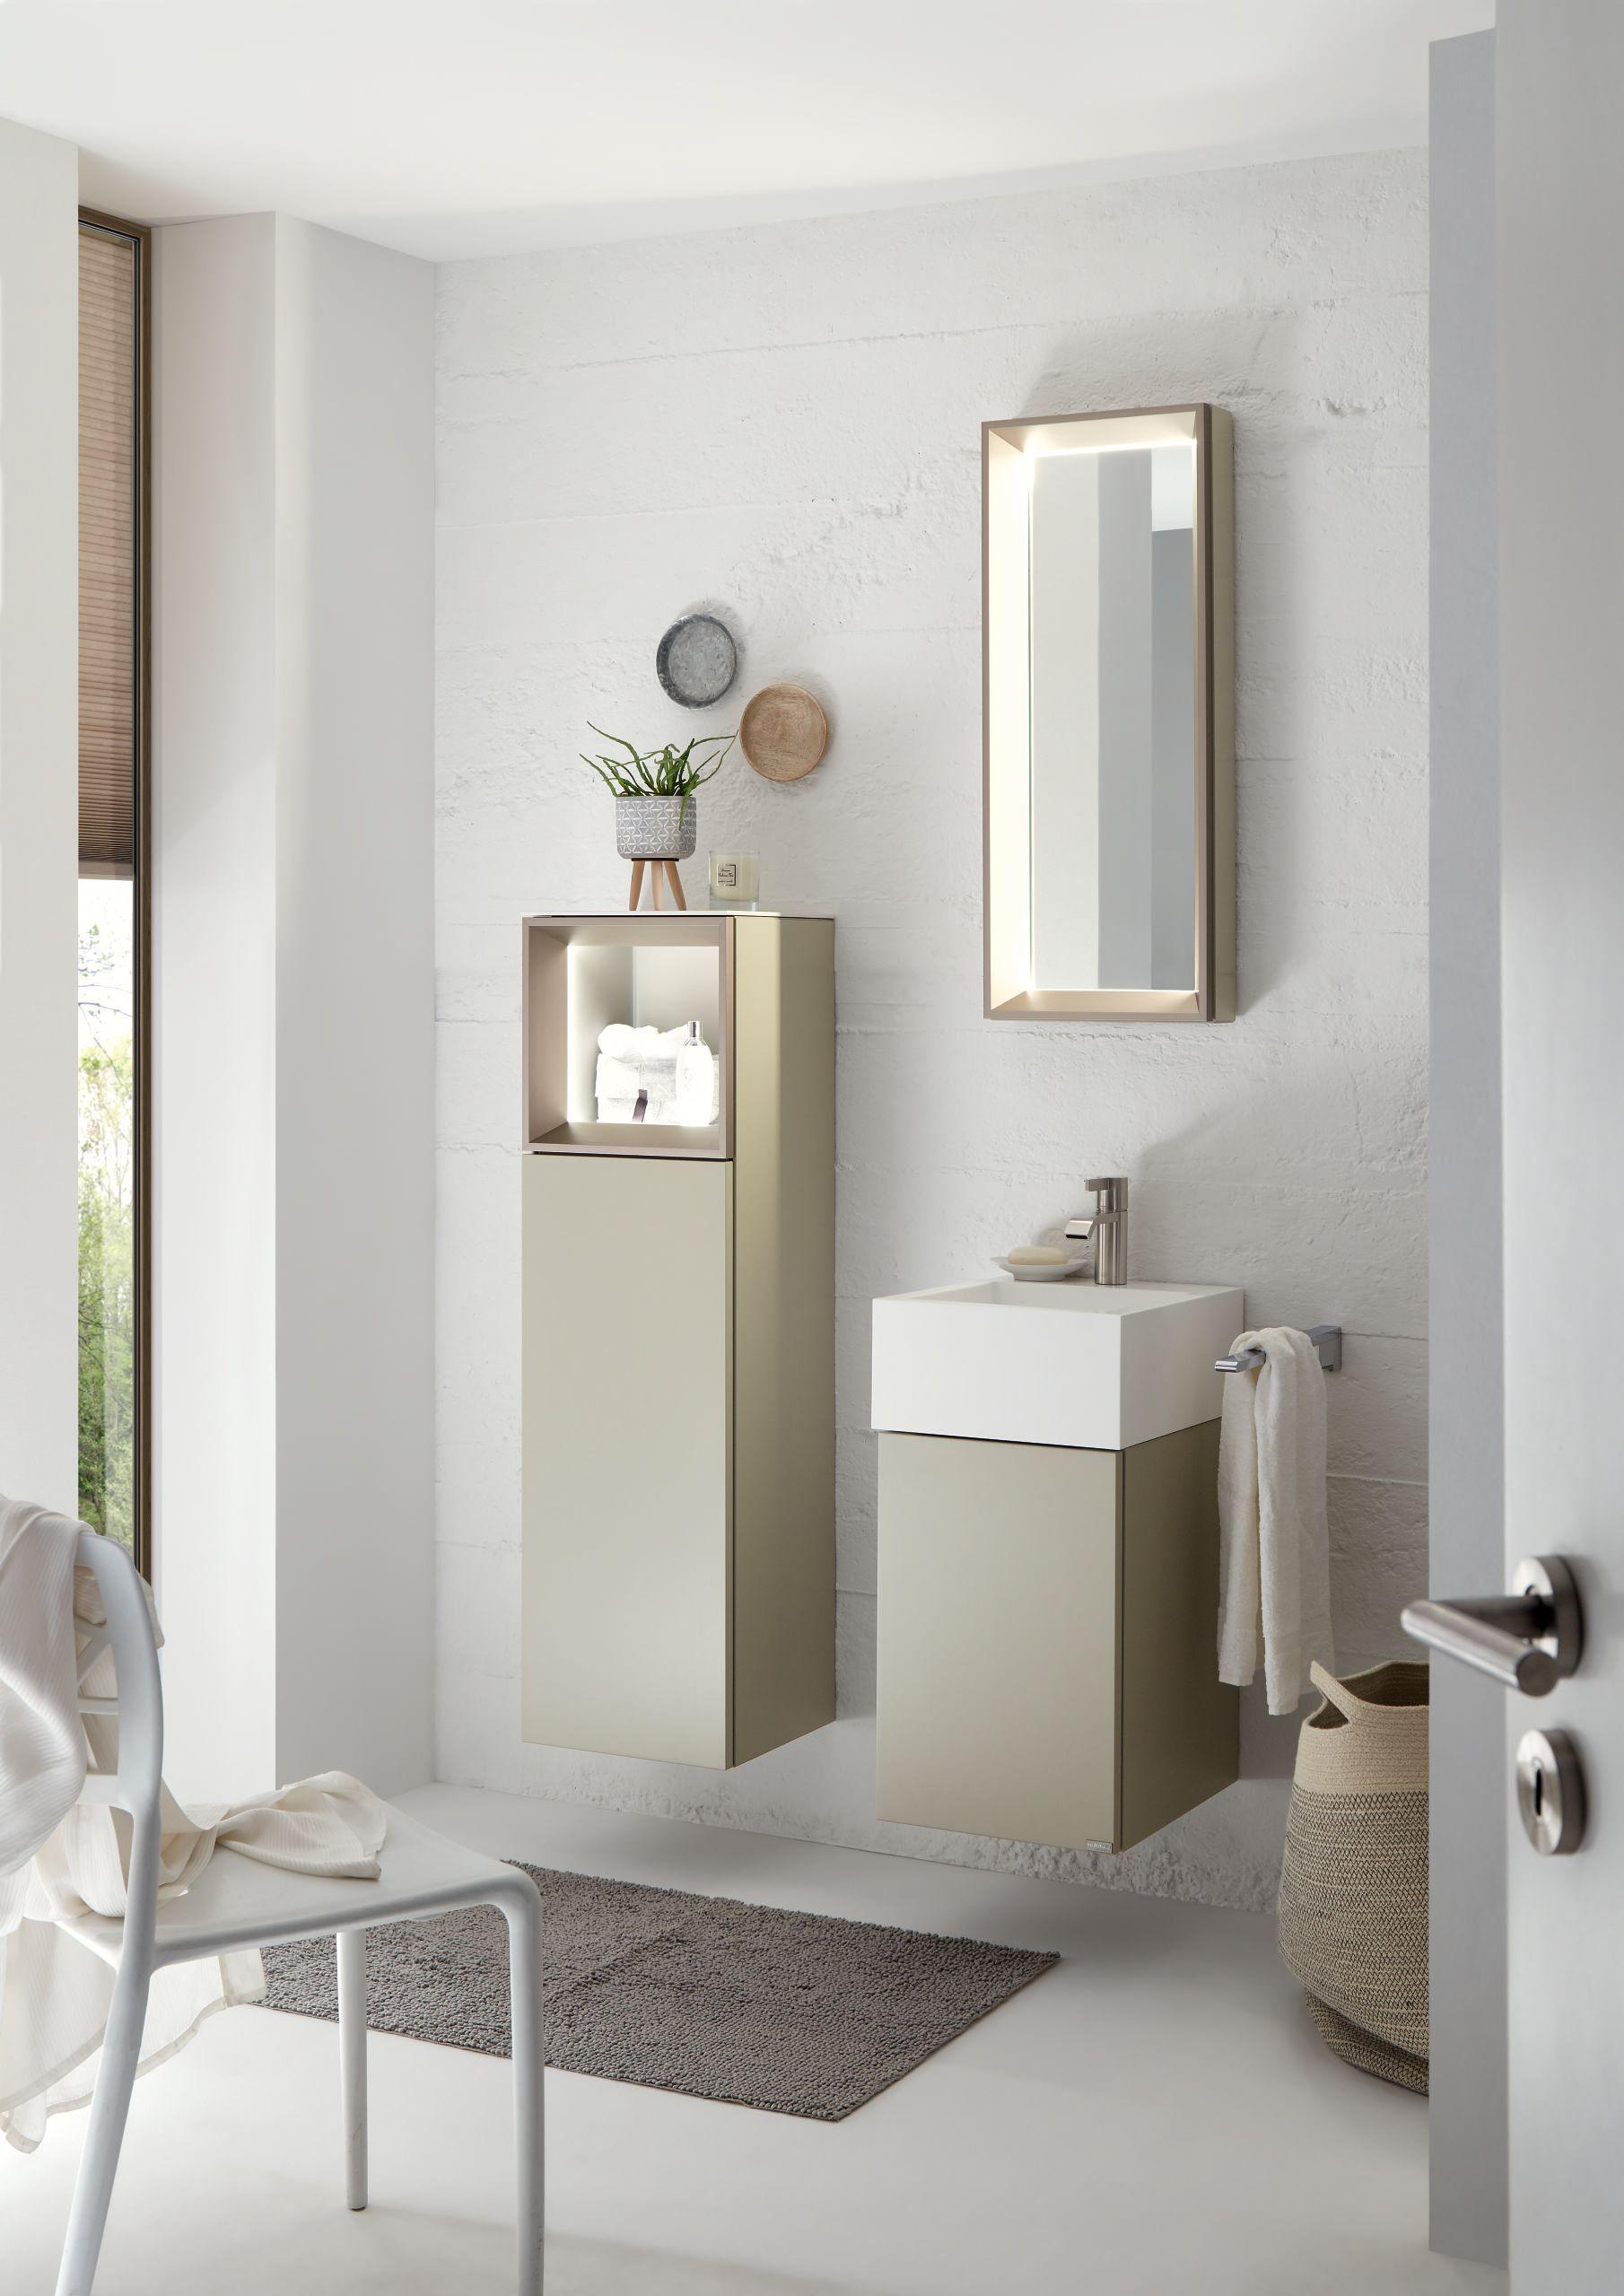 Badezimmerset Hulsta Tetrim Badezimmereinrichtung Badezimmer Inspiration Badezimmerideen